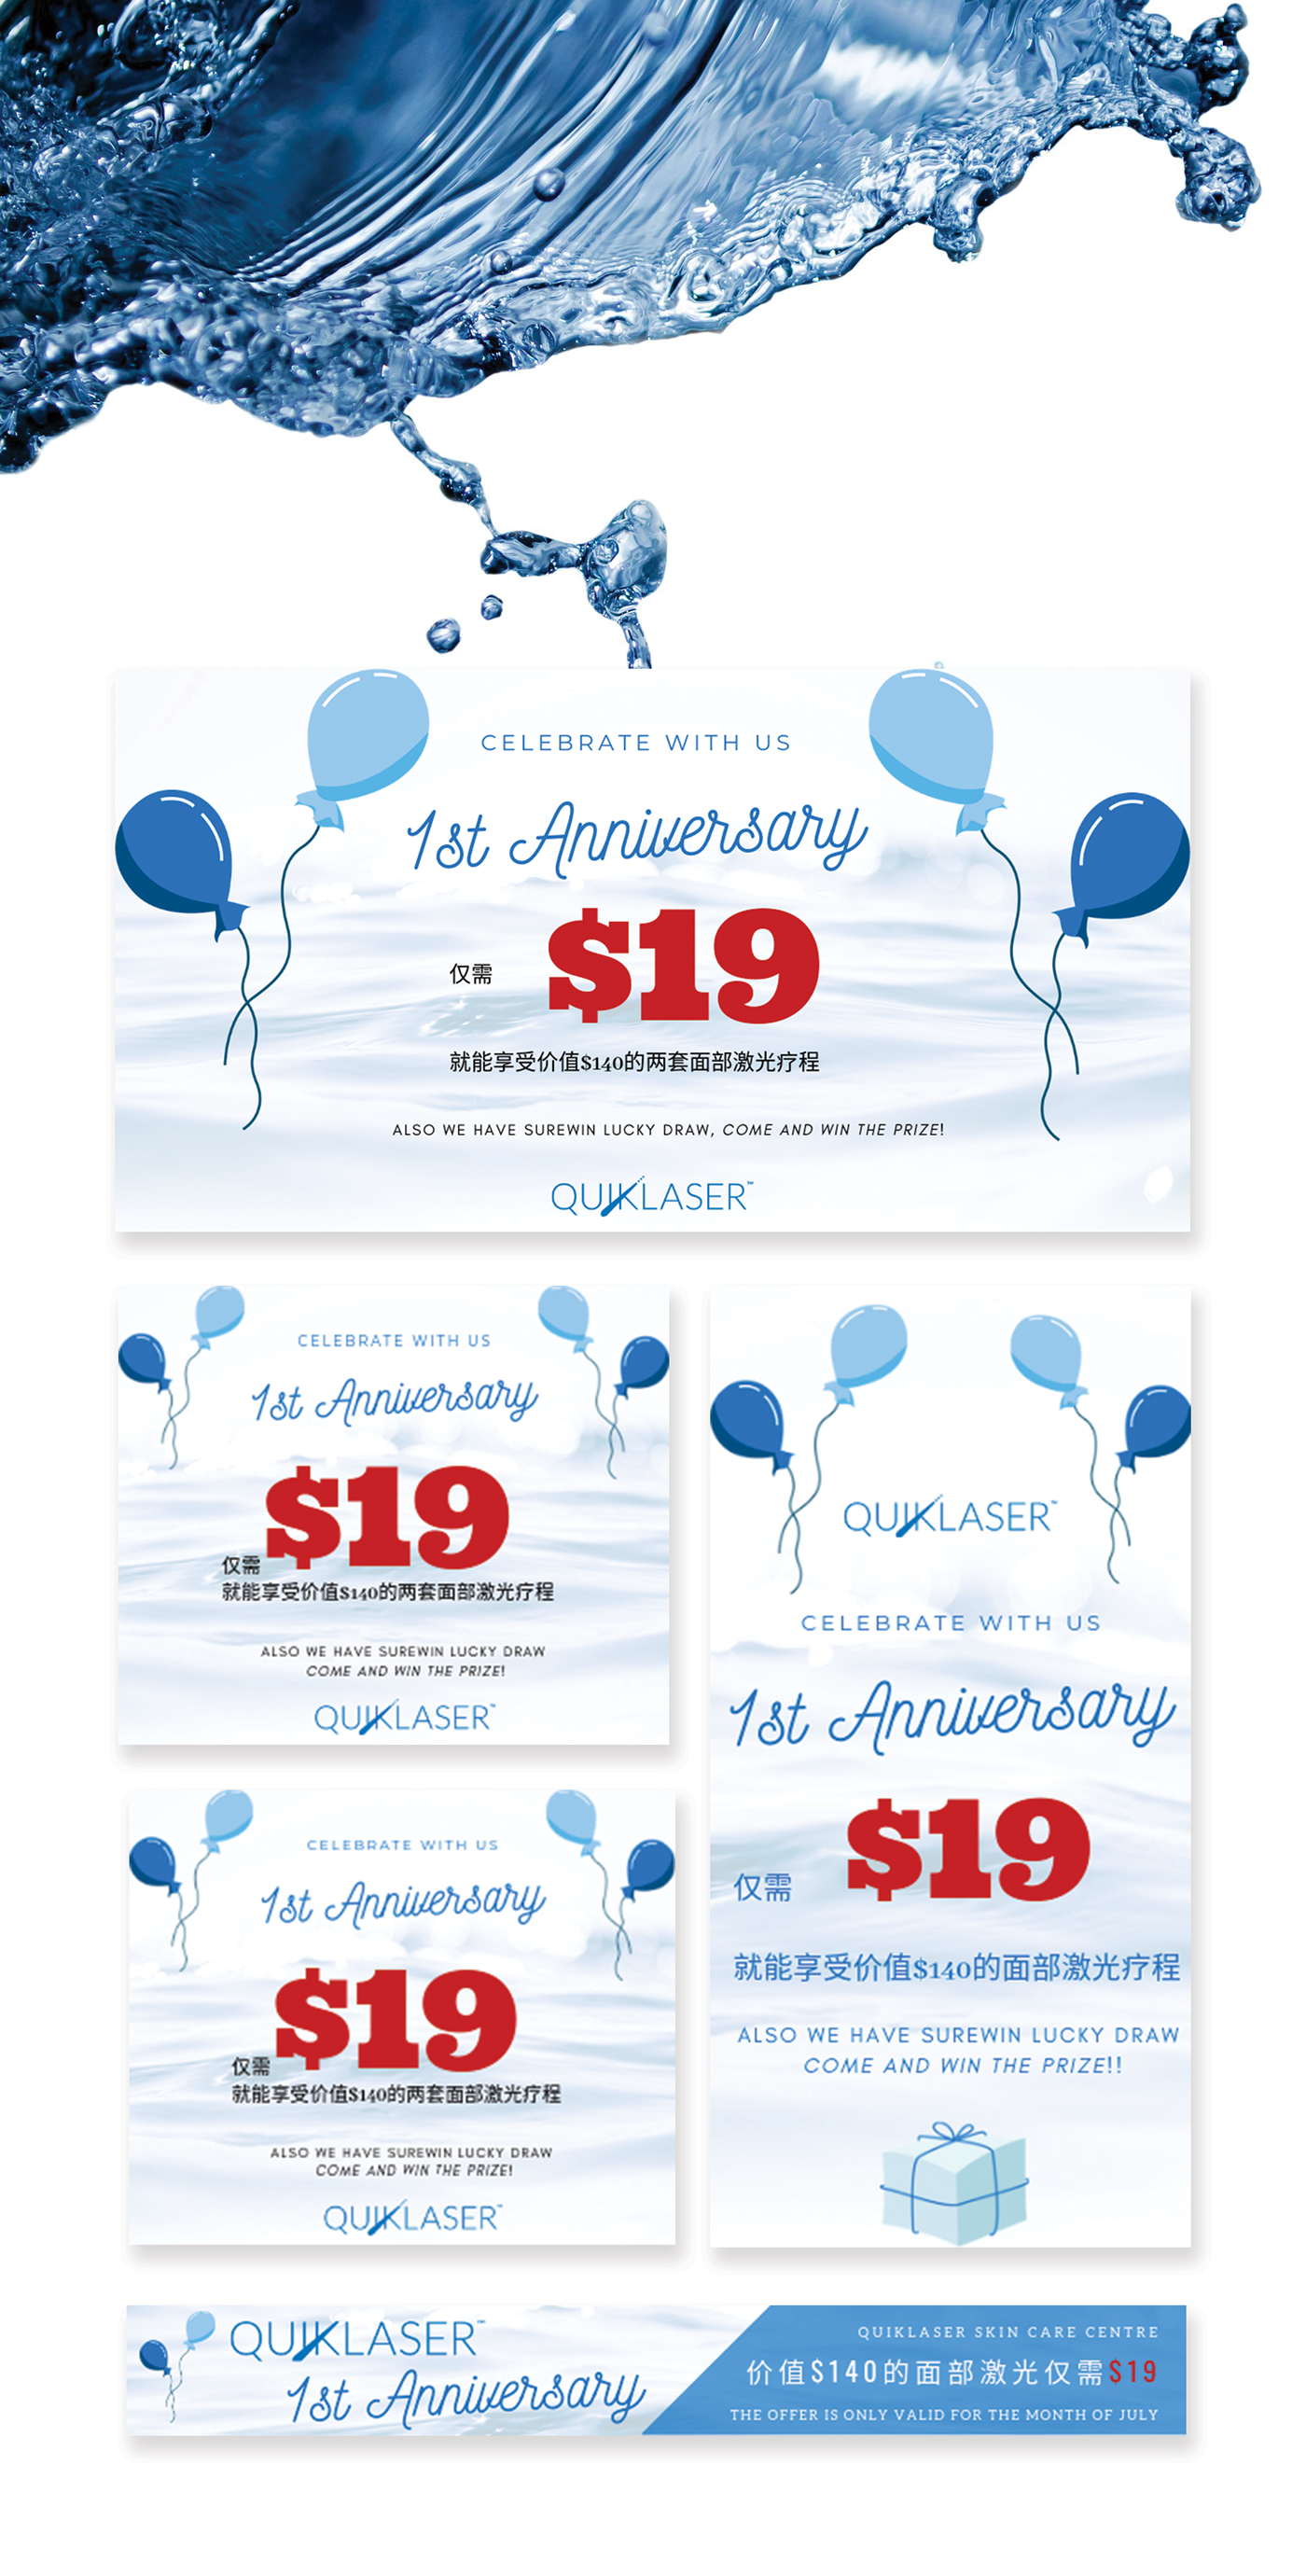 google ads digital marketing Illustrator beauty Website advertisement marketing